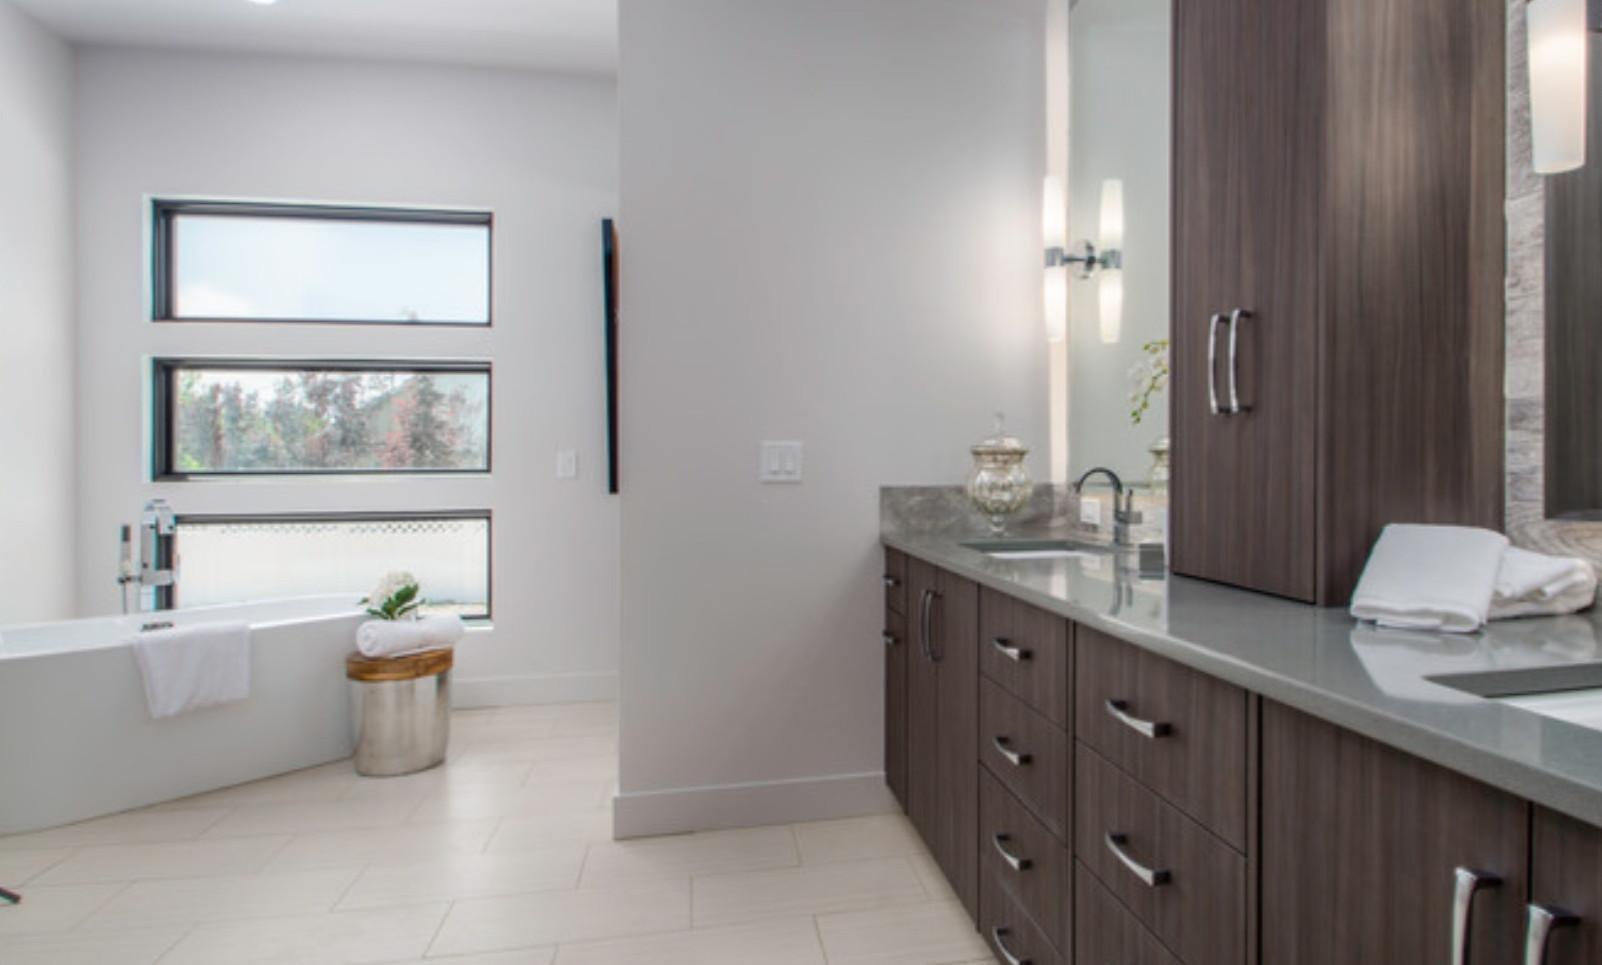 Bathroom sample 4